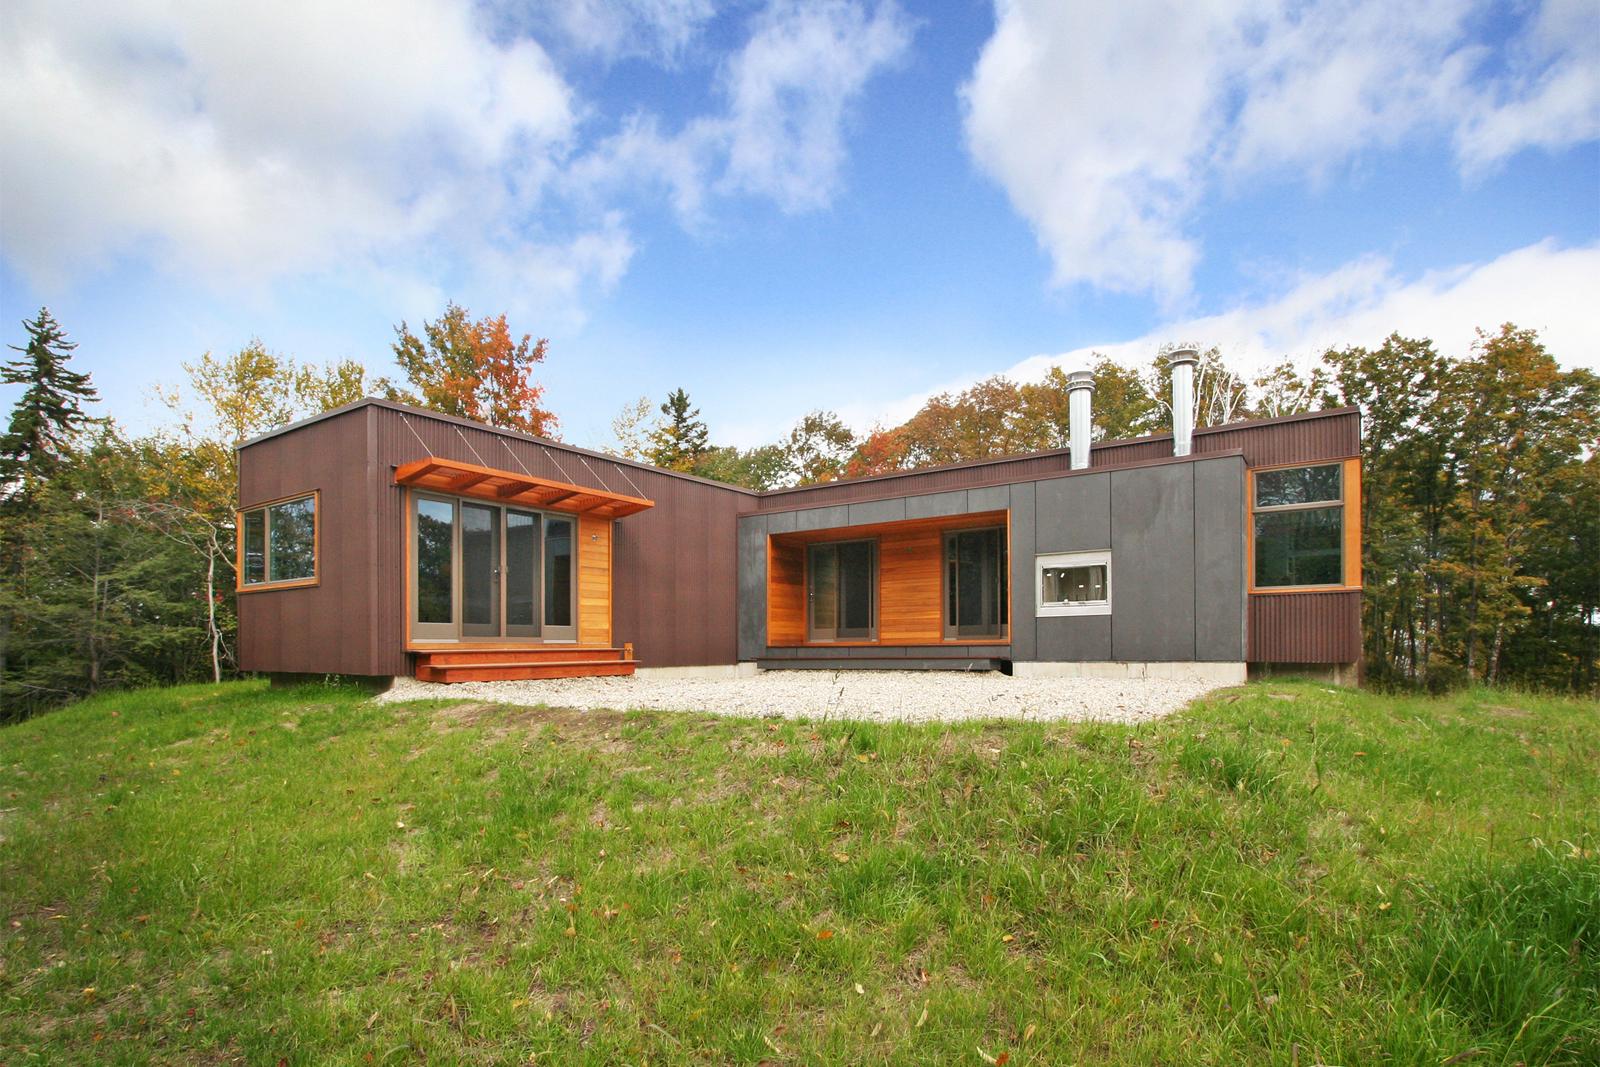 10-res4-resolution-4-architecture-modern-modular-home-prefab-house-vermont-cabin-exterior.jpg